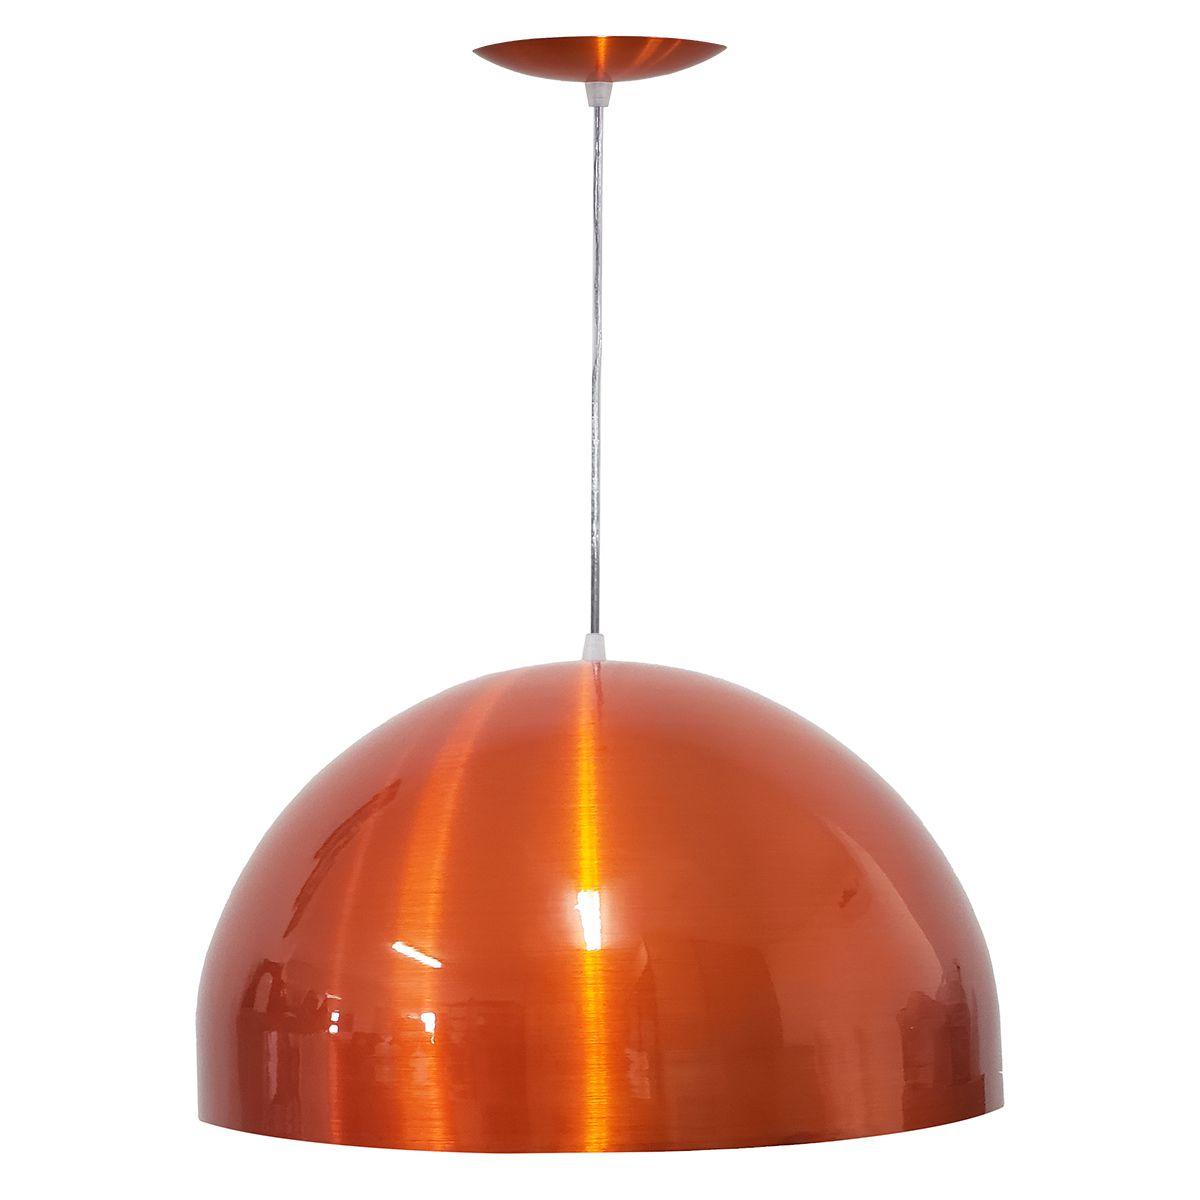 Luminária Decorativa Meia Esfera 30 Laranja Cobre Pendente